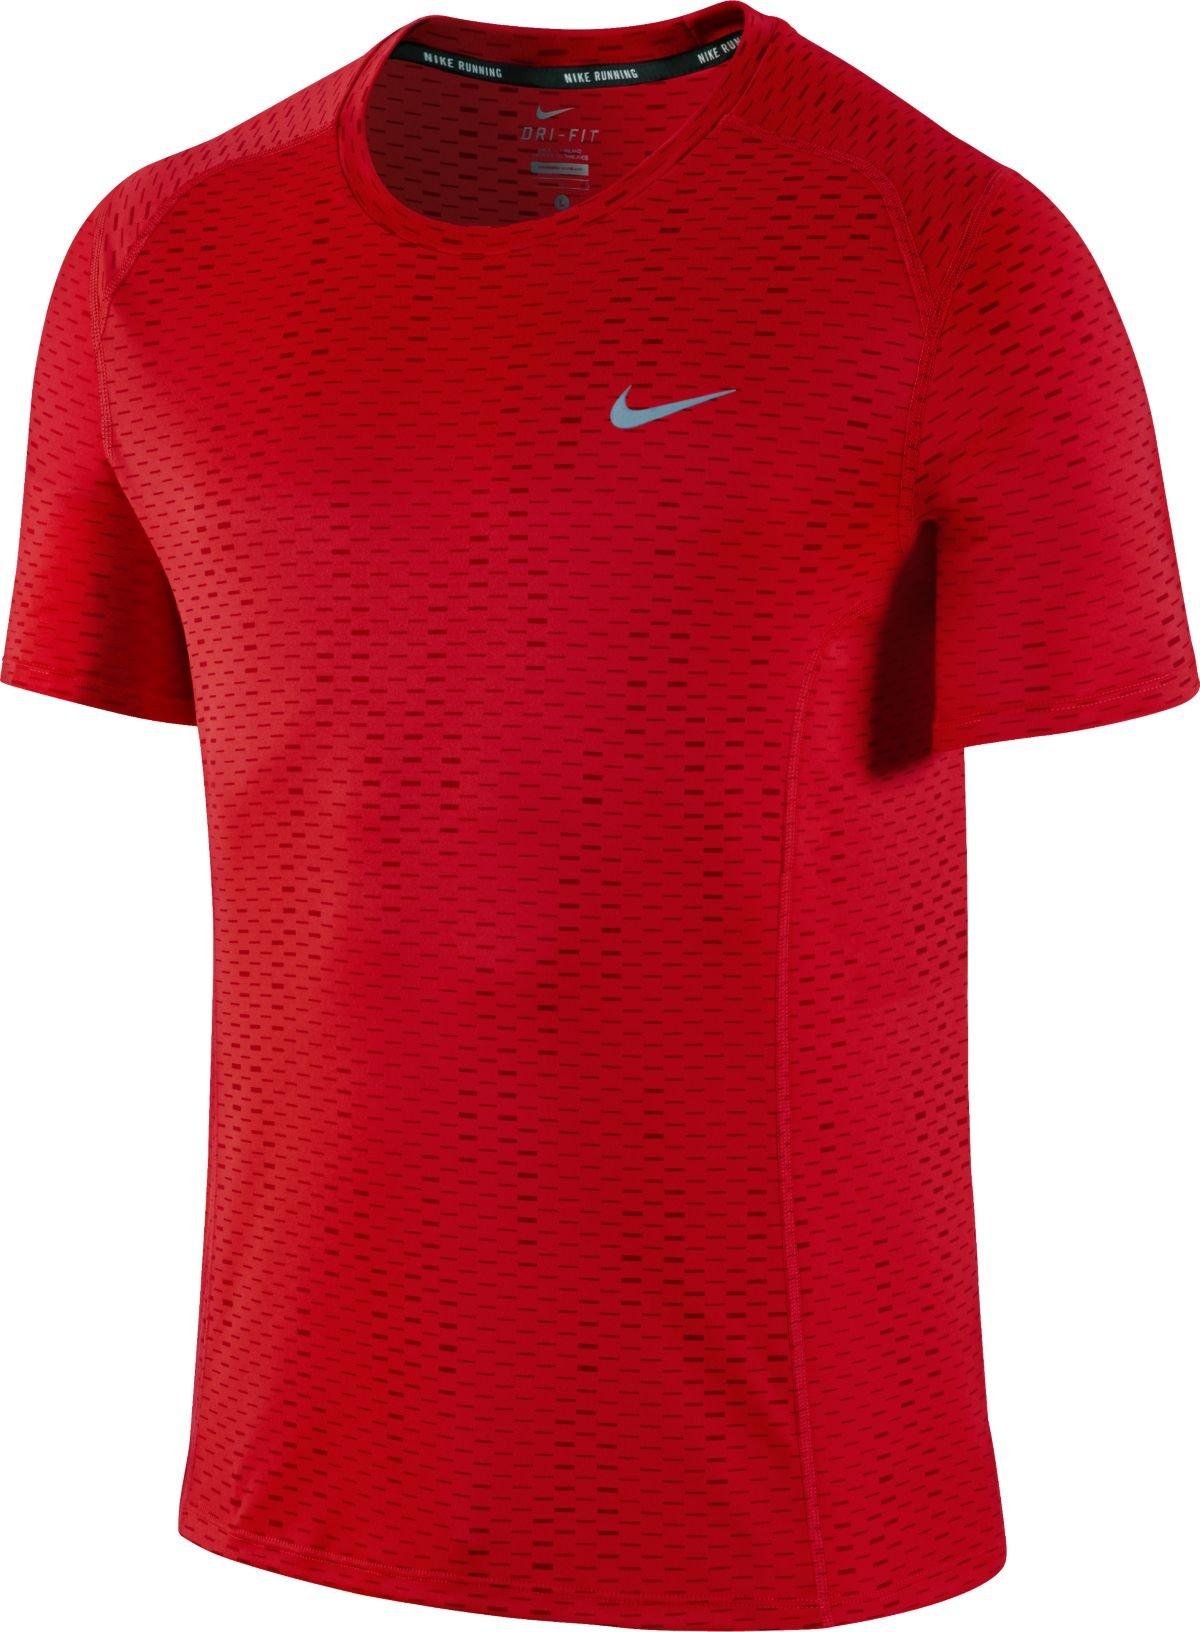 Triko Nike DRI-FIT MILER FUSE SS